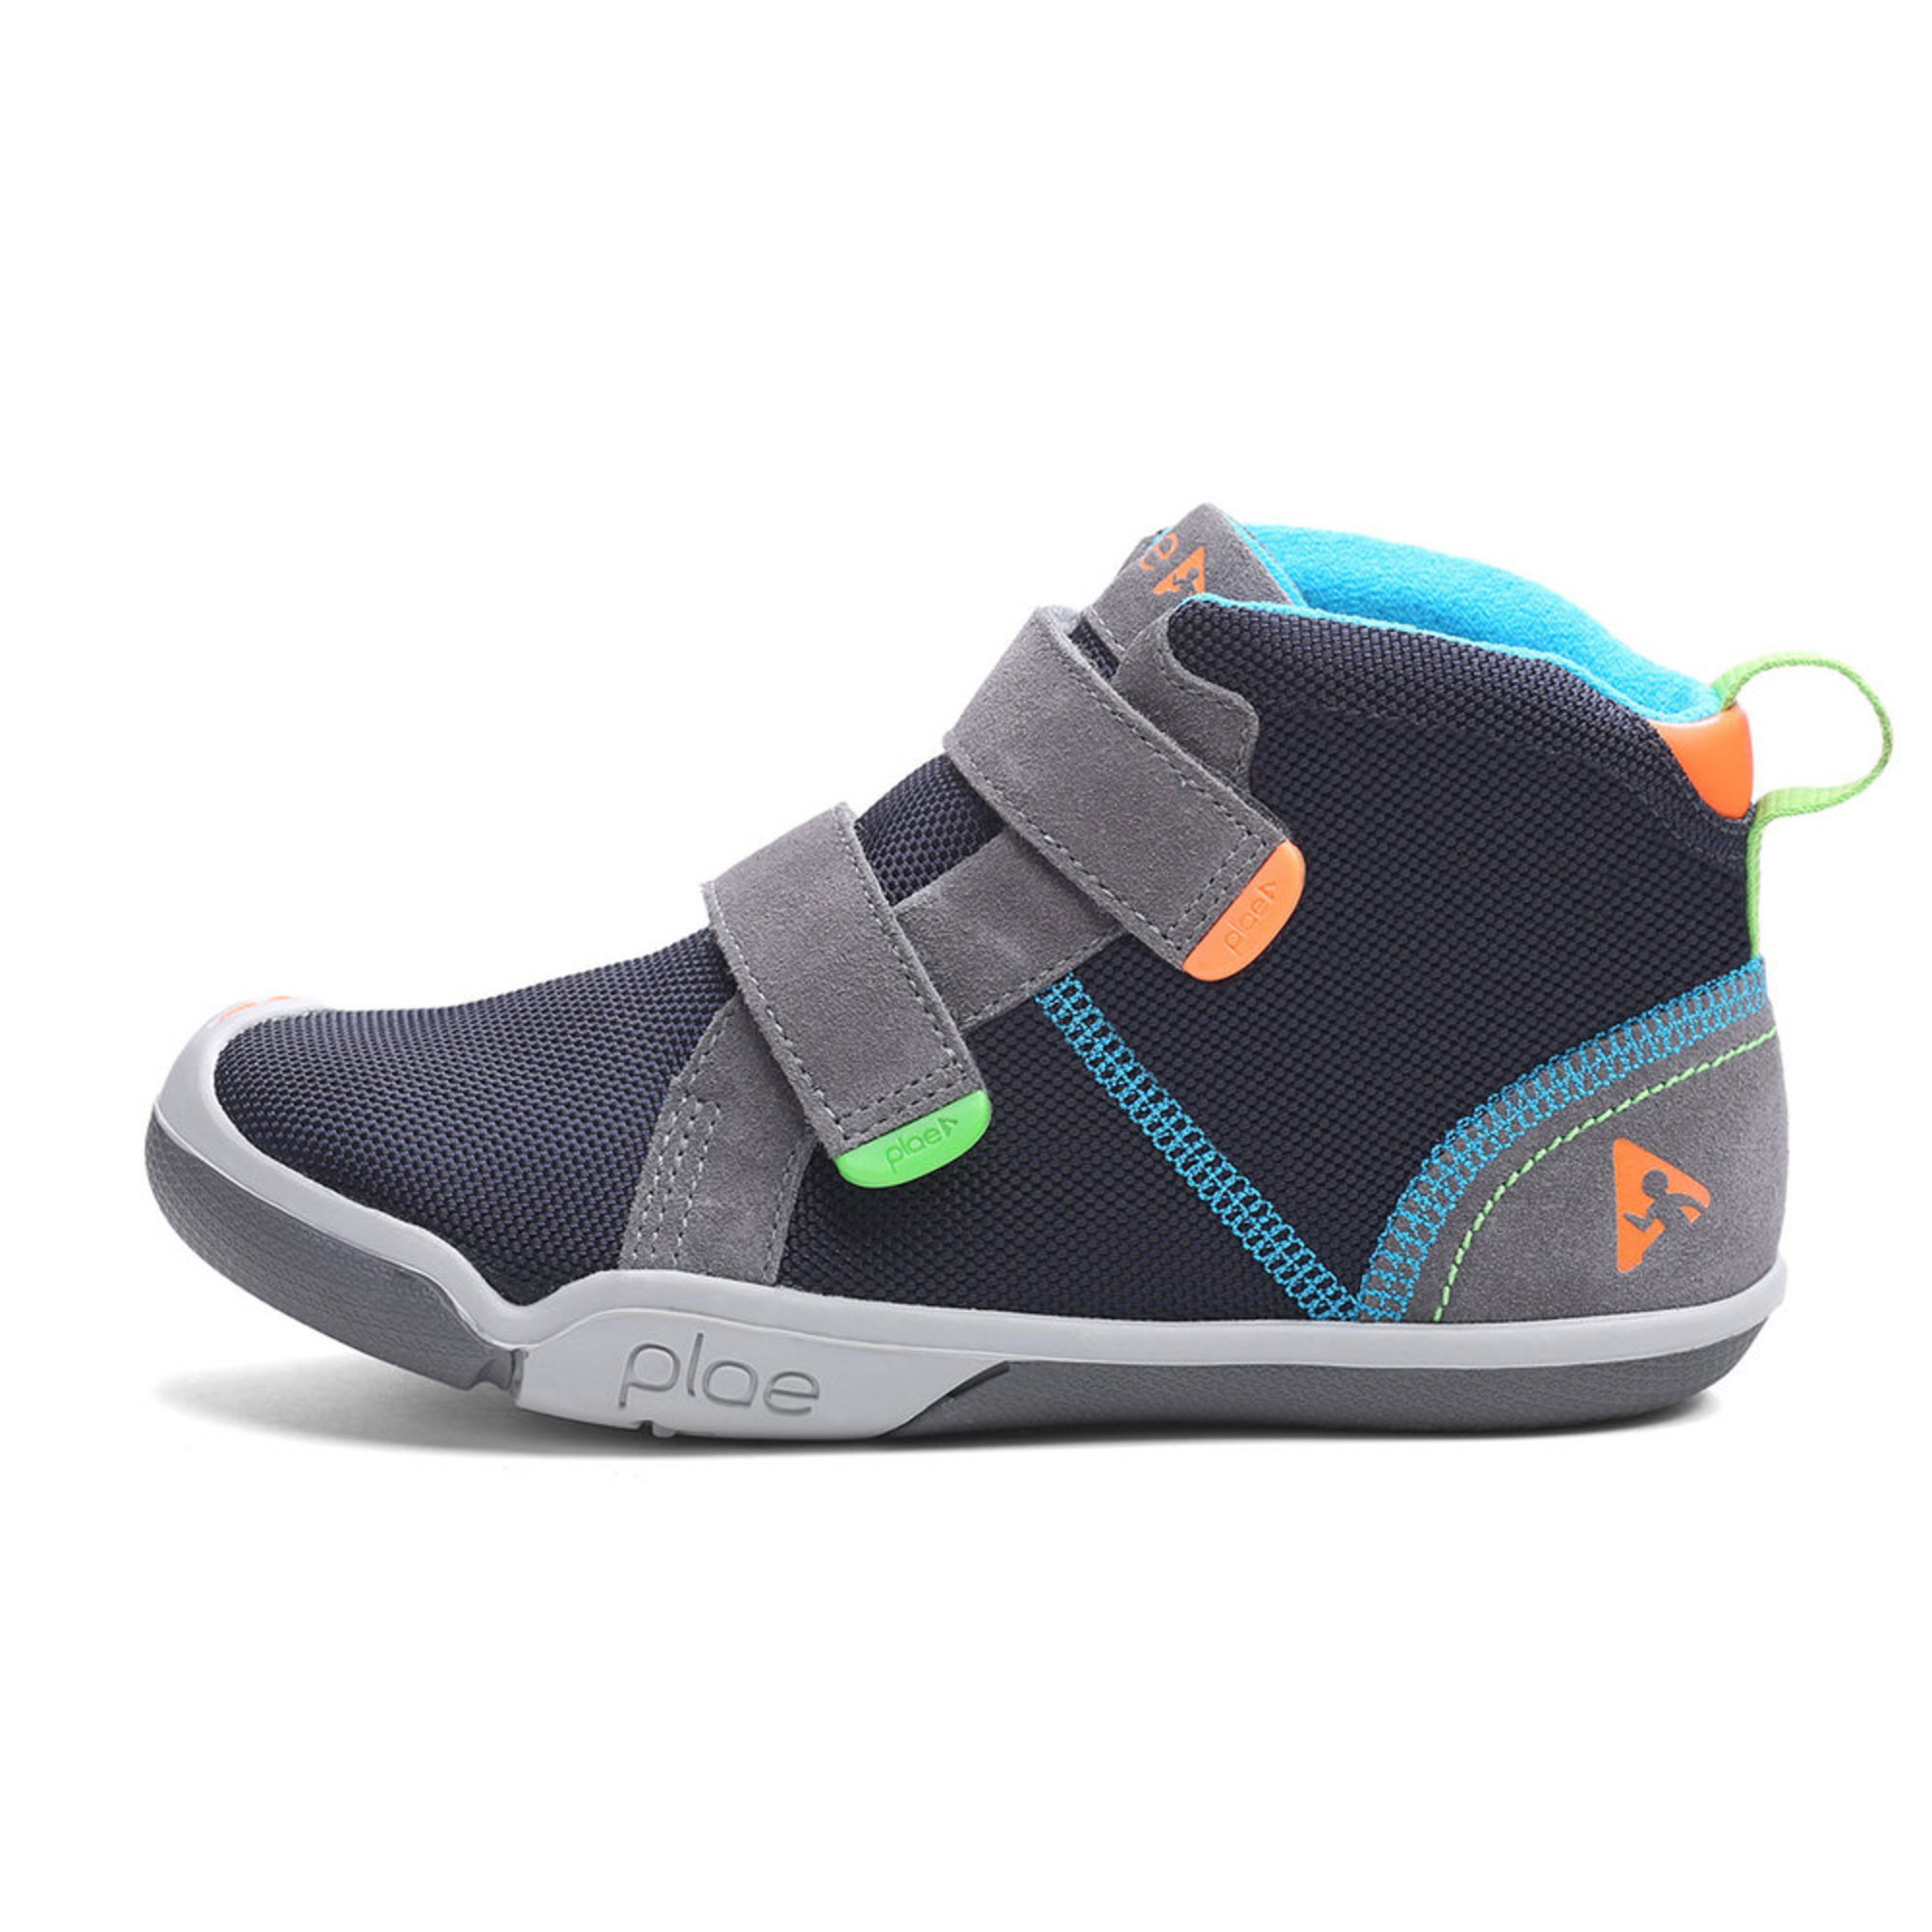 Plae Shoes Reviews